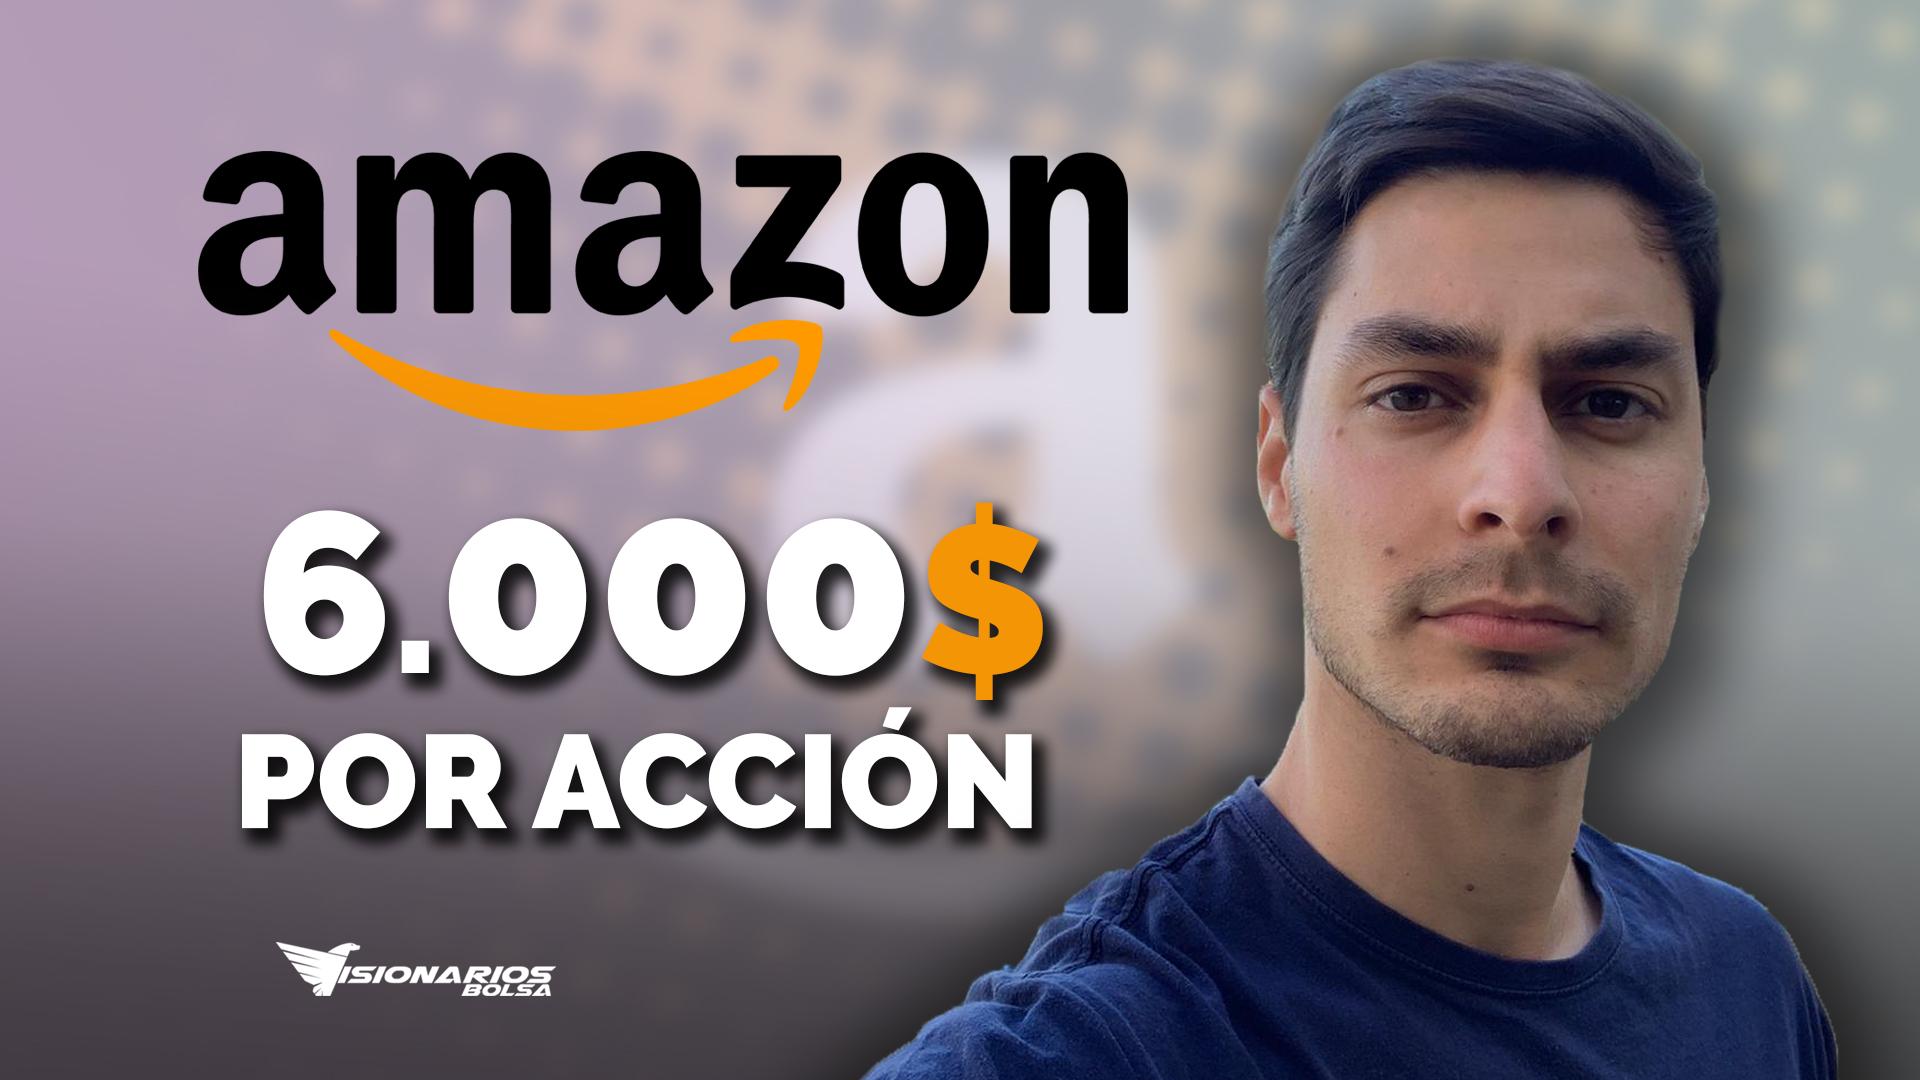 Análisis De AMAZON -> Llegará A 6.000$ Por Acción